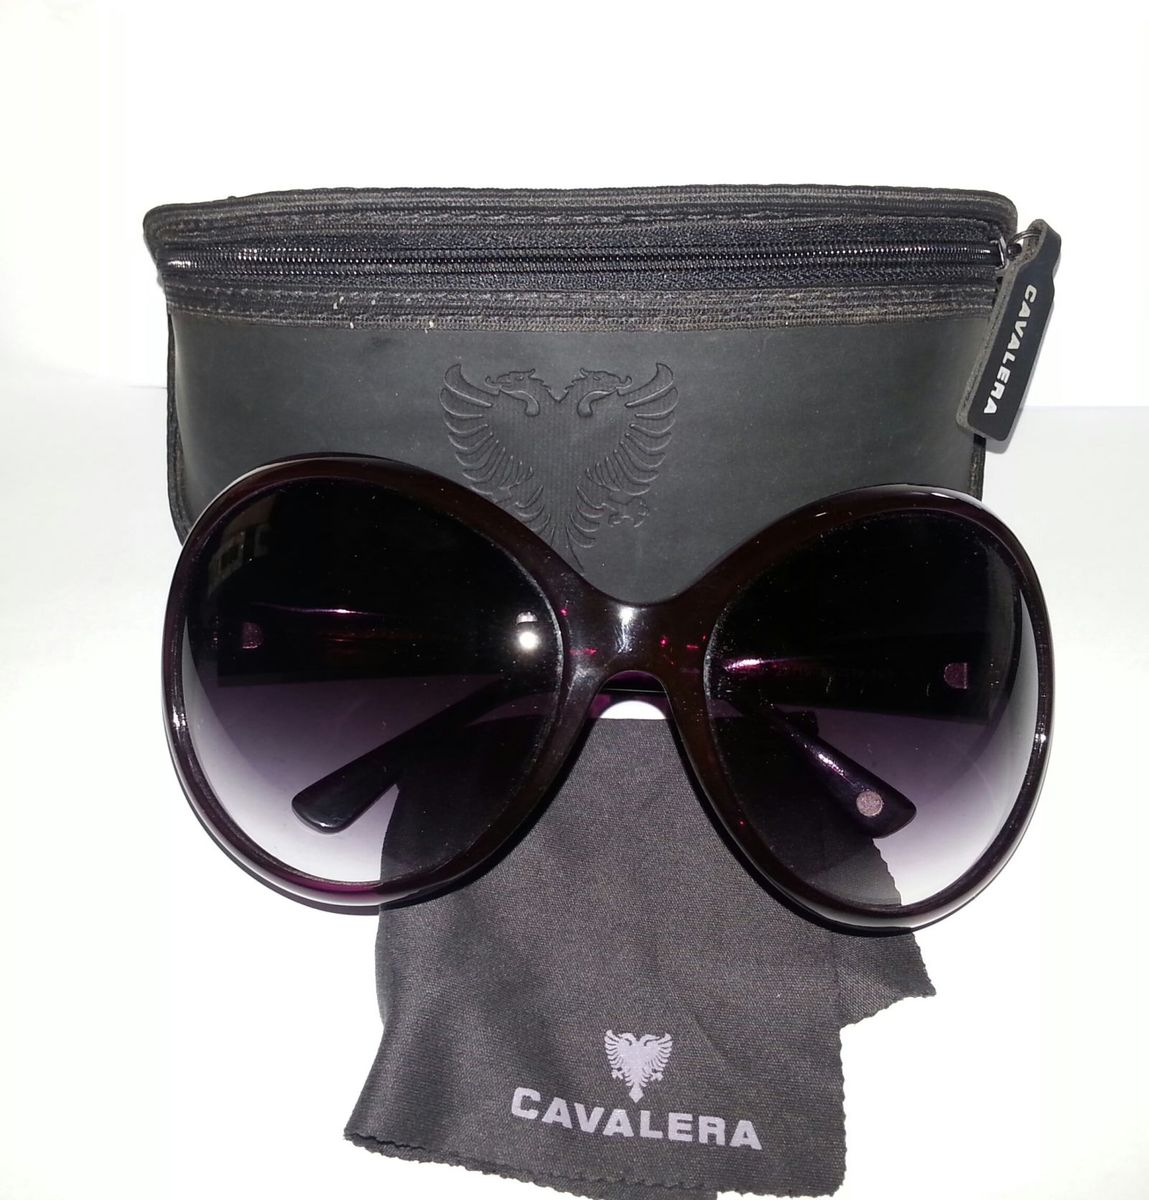 933898cb3 Oculos de Sol Cavalera Feminino - Original Roxo | Óculos Feminino ...